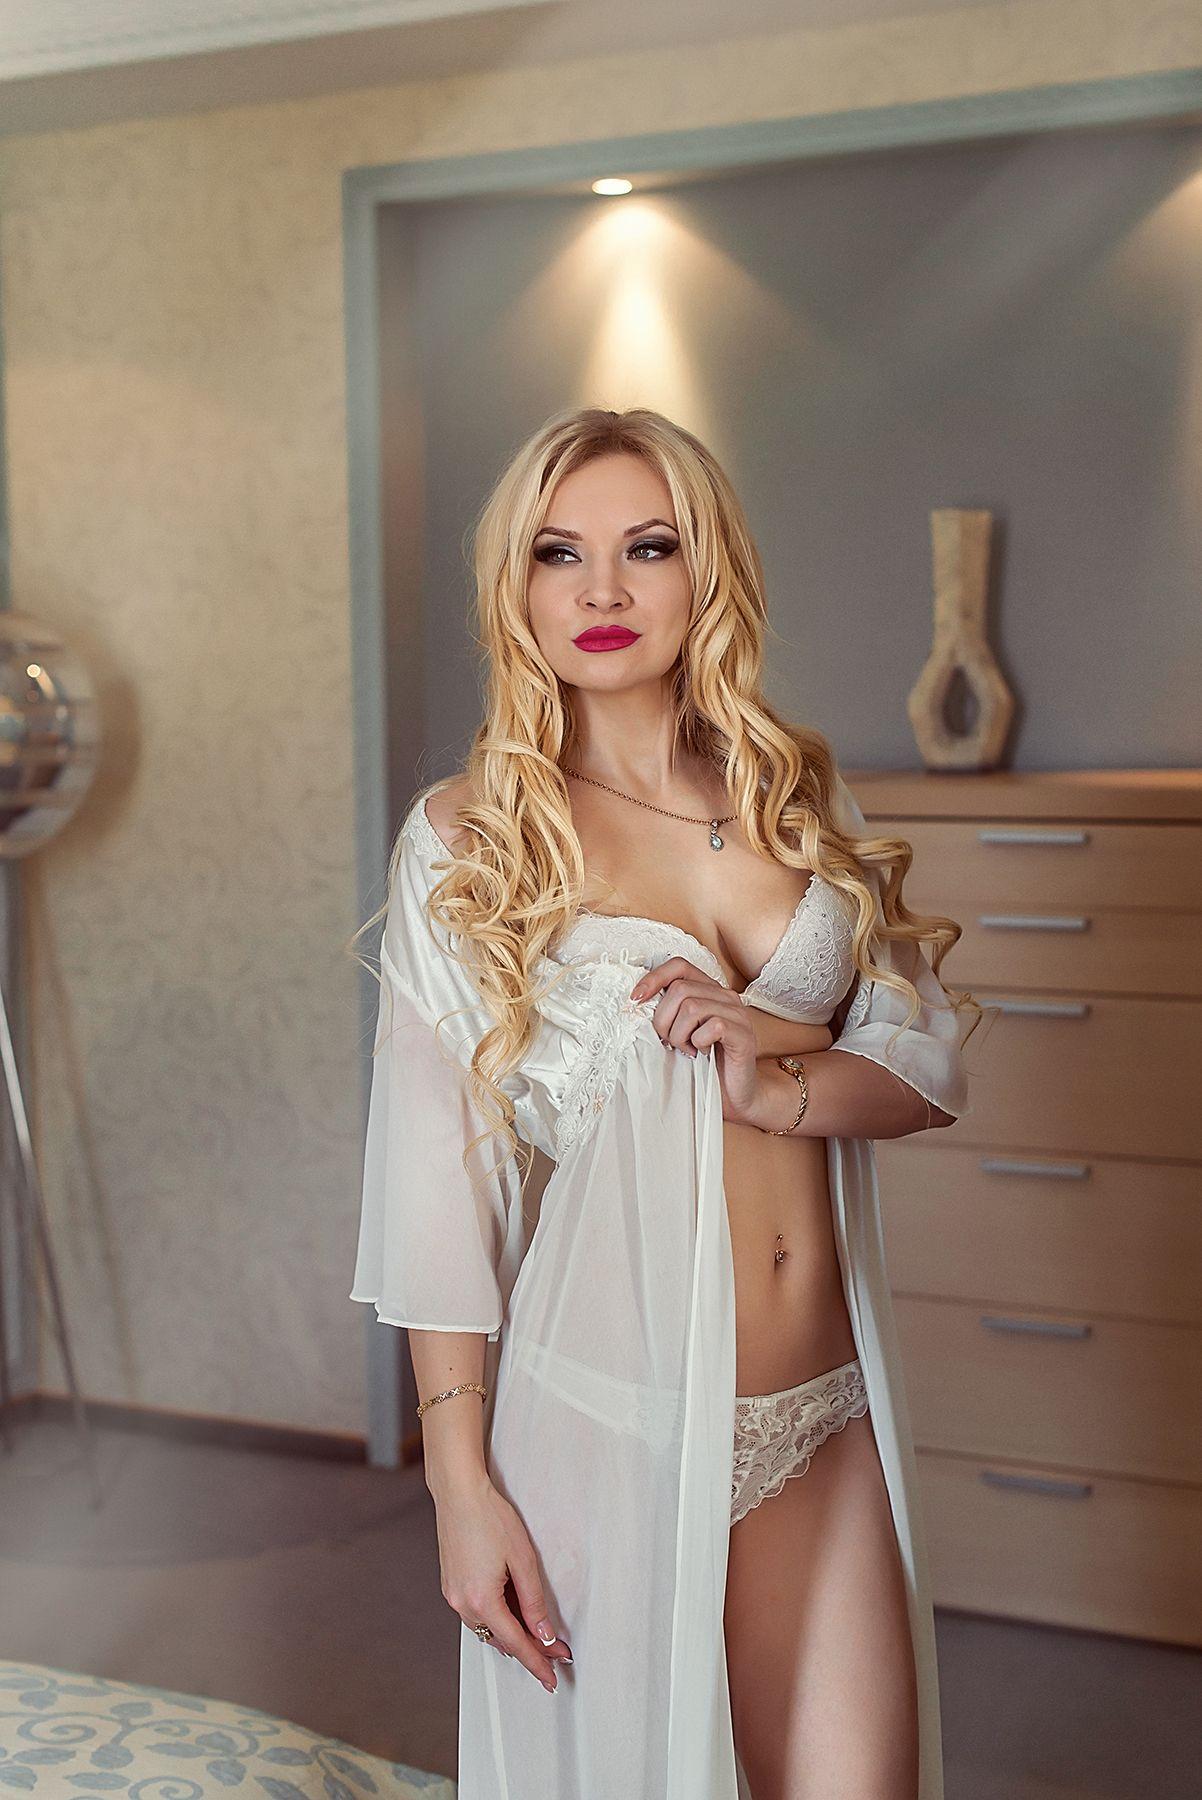 35PHOTO.App - Author: Георгий Дьяков, ***